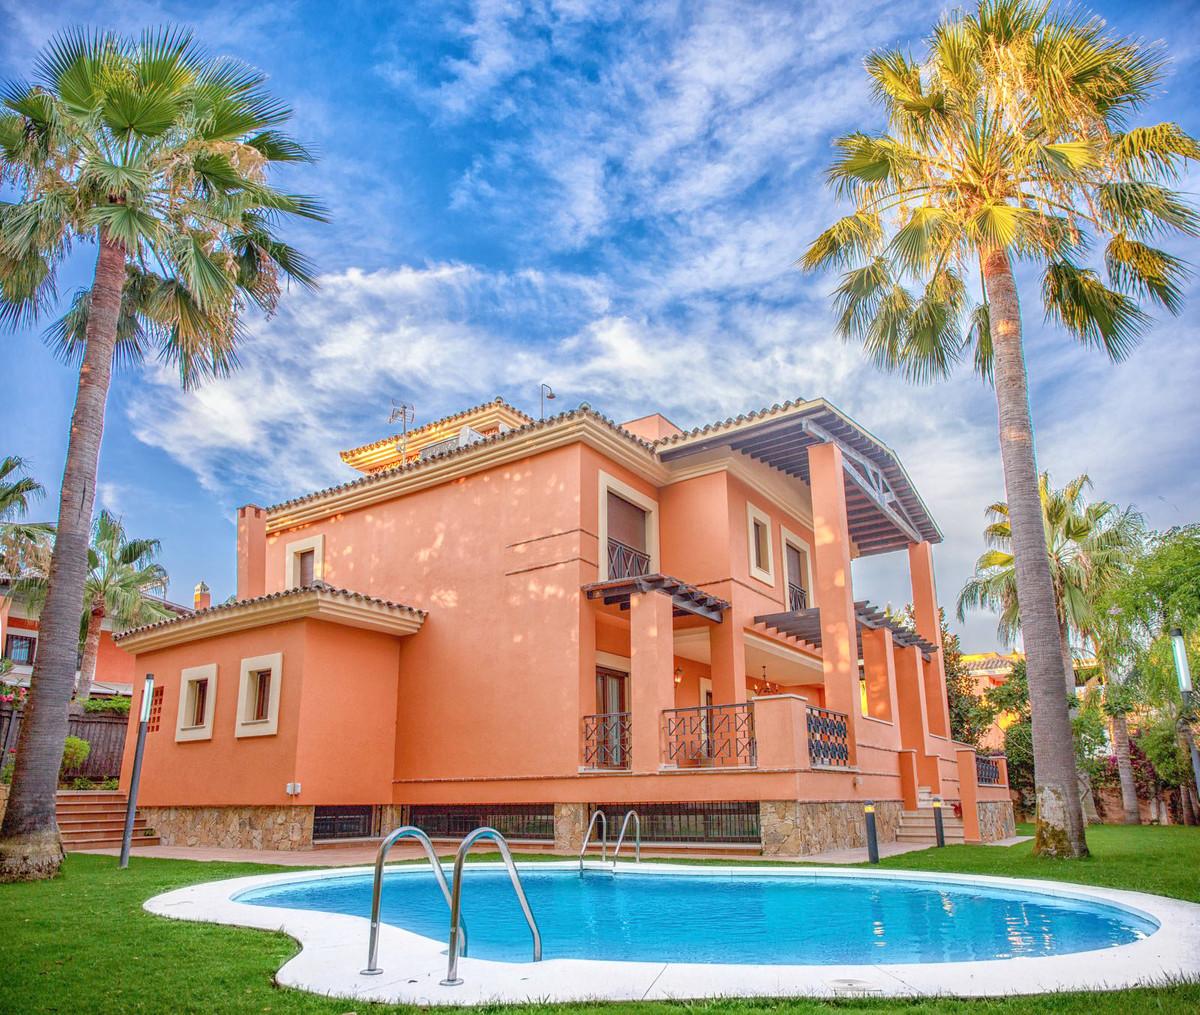 VILLA FOR SALE CLOSE TO THE BEACH IN LOS MONTEROS PLAYA MARBELLA Los Monteros, Marbella East  Andalu,Spain